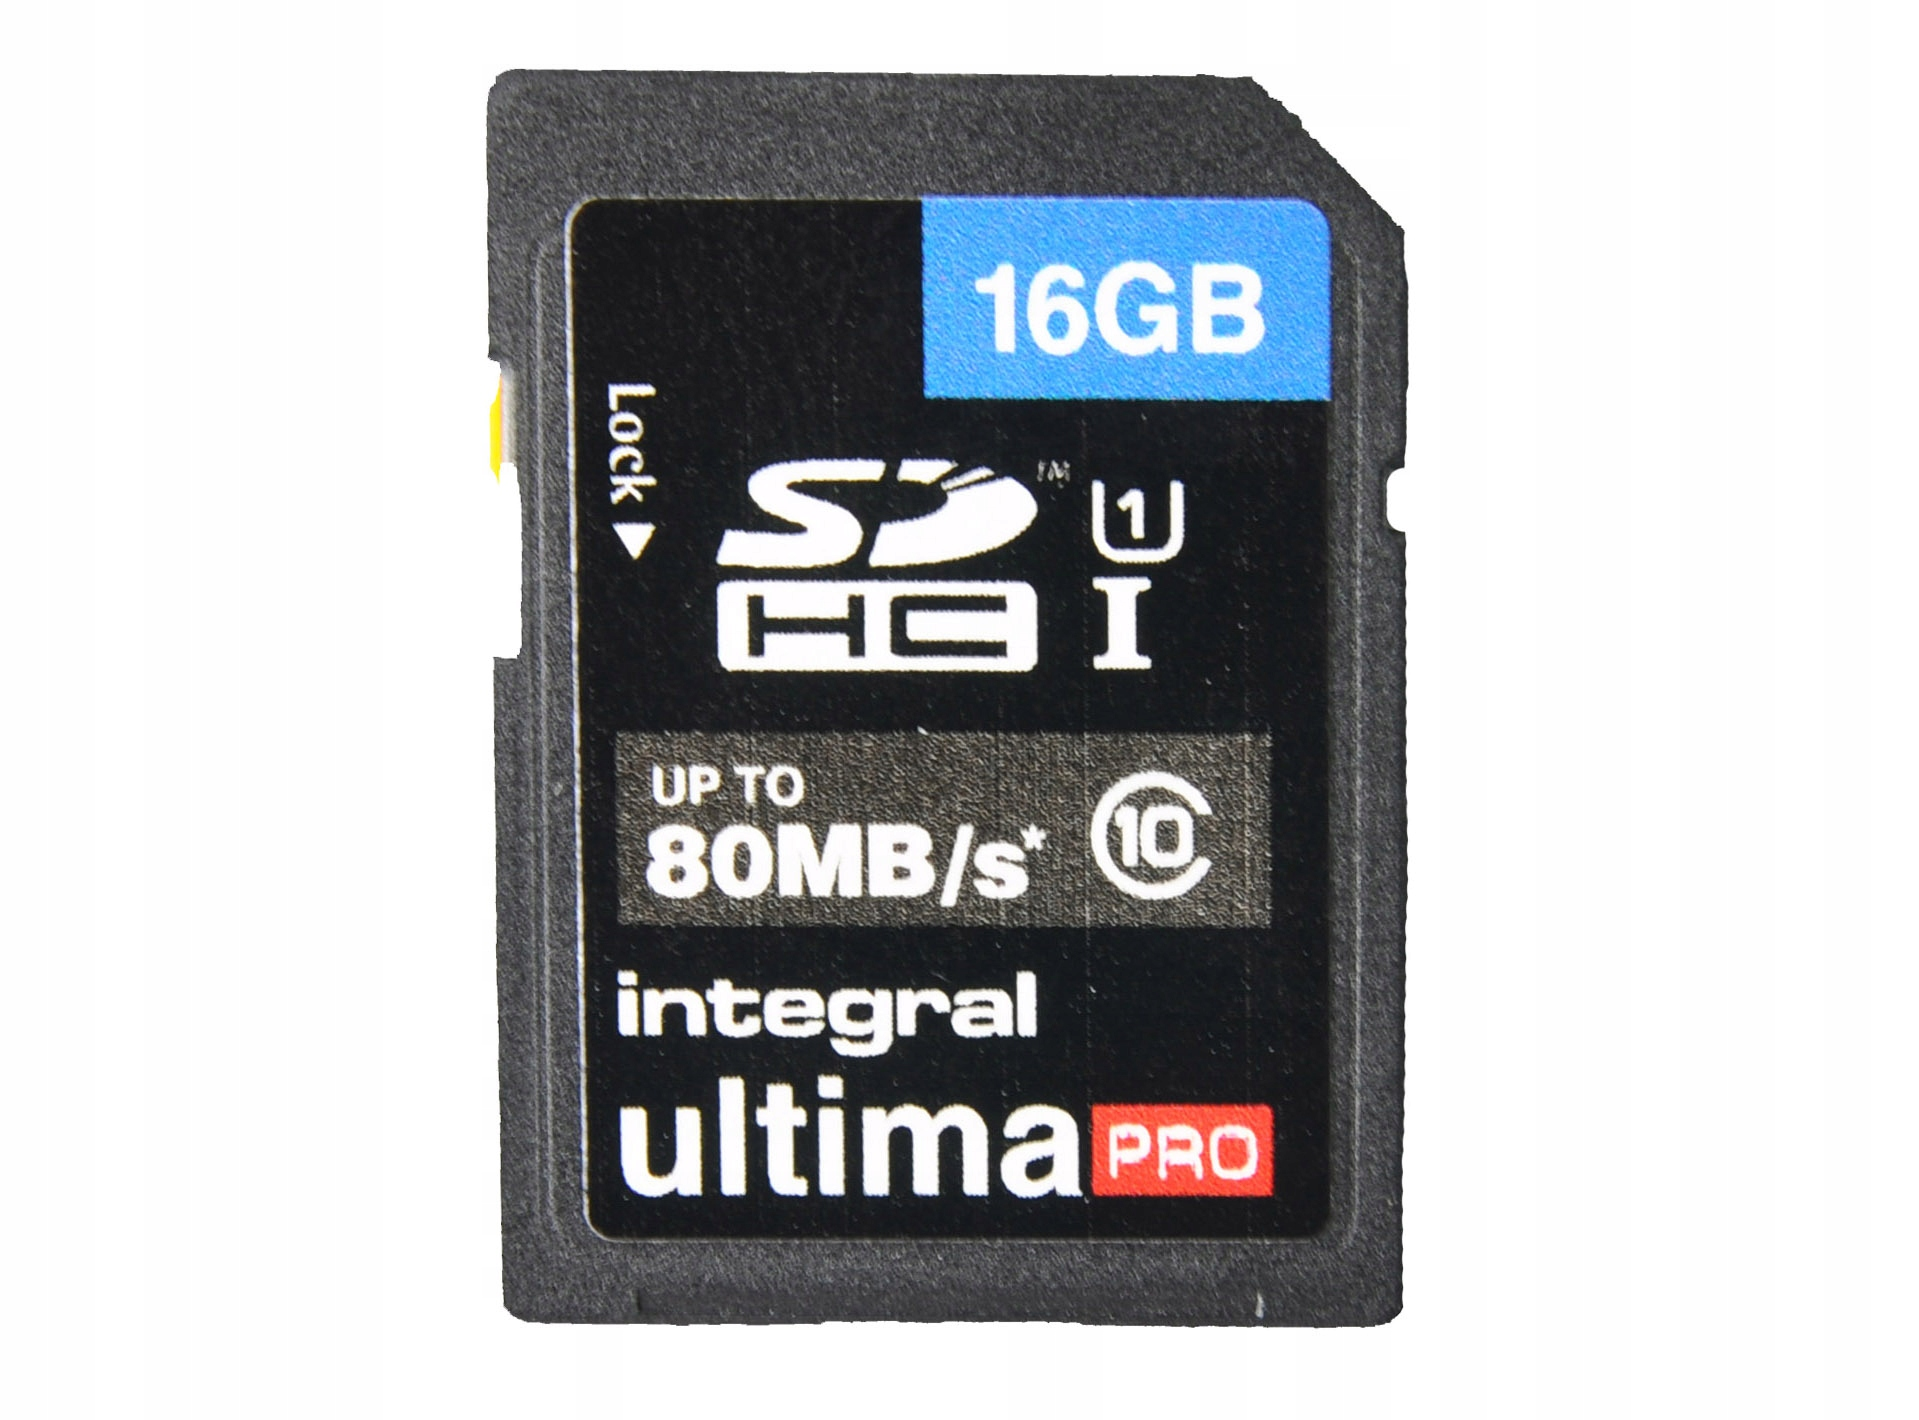 KARTA PAMIĘCI SDHC ULTIMA PRO 16GB 80MB/s C10